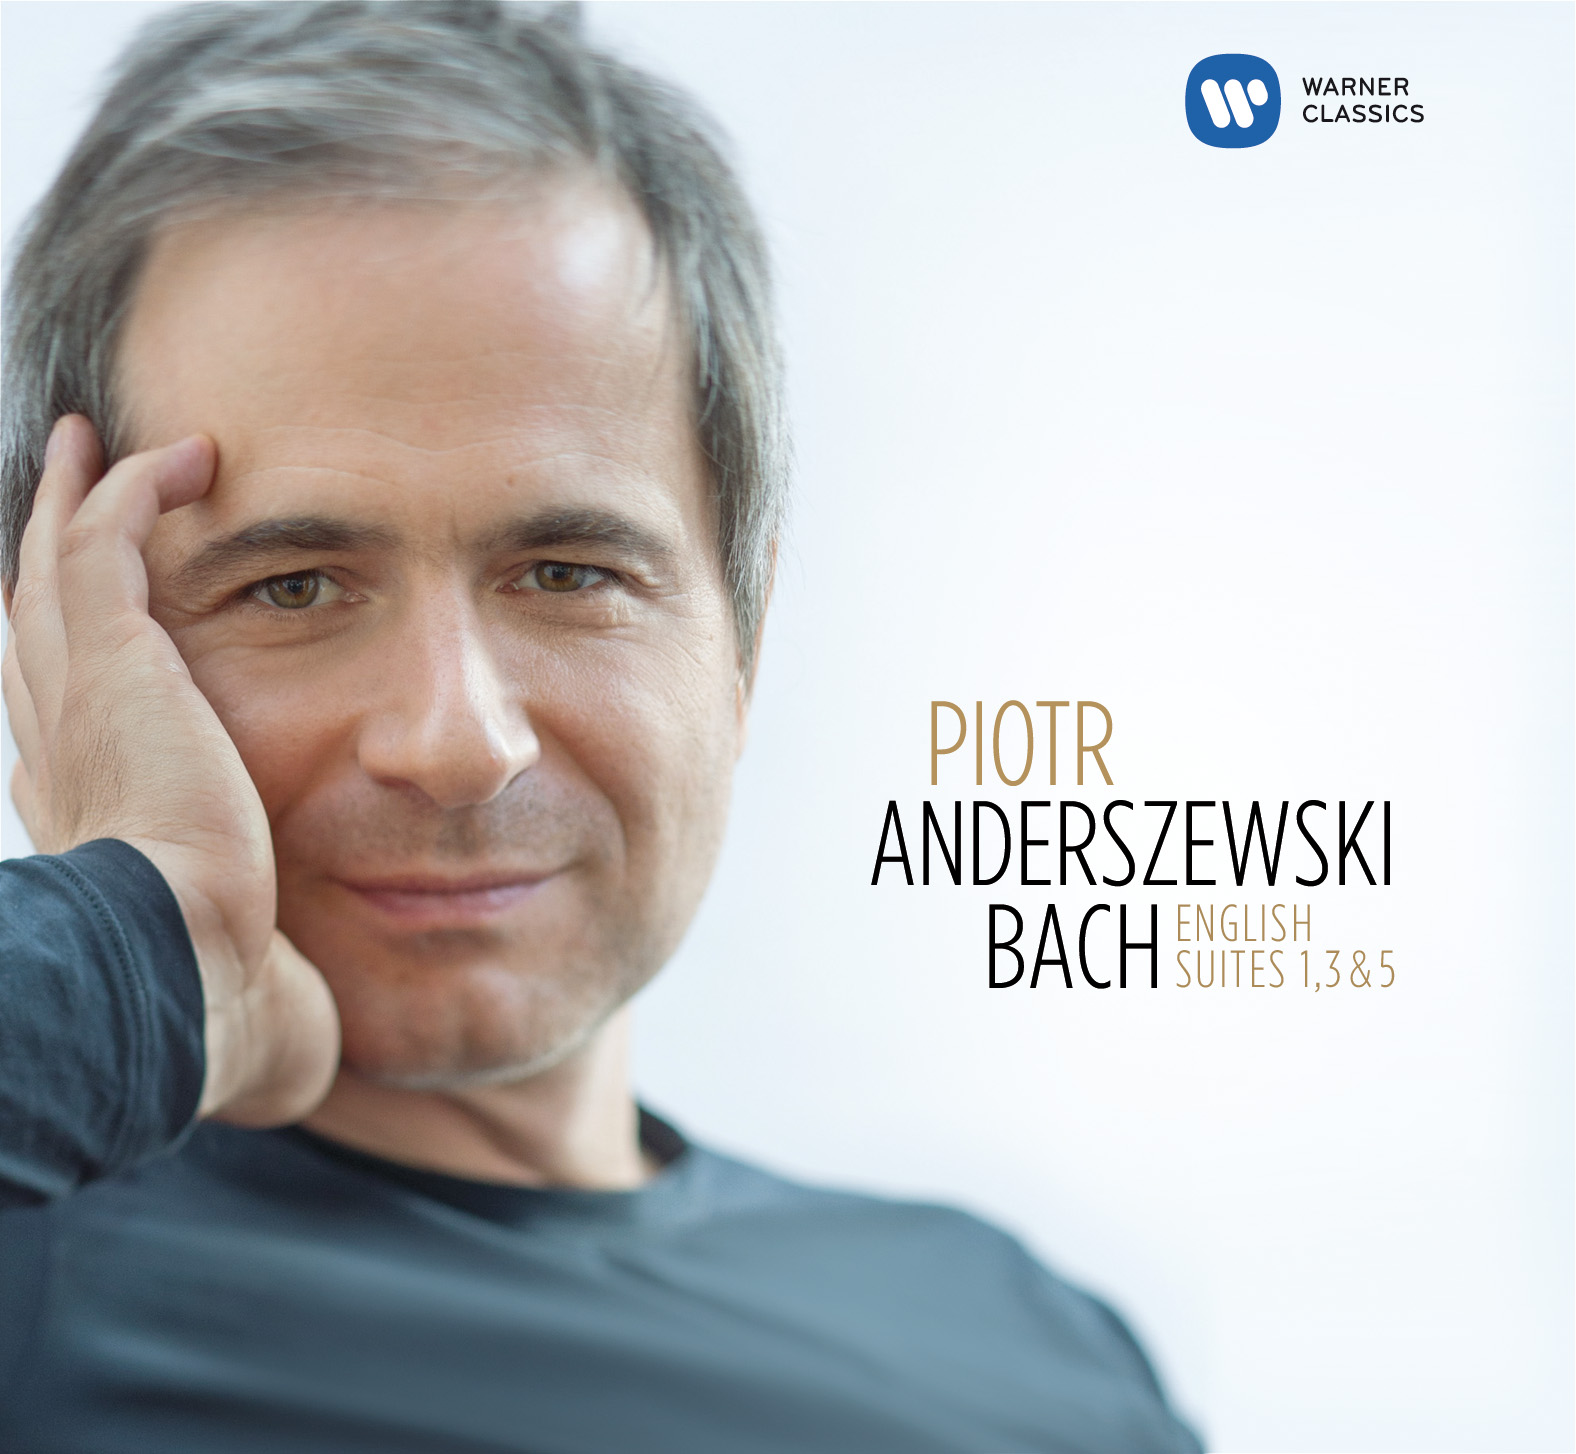 ANDERSZEWSKI - Bach Suites anglaises 1,3,5